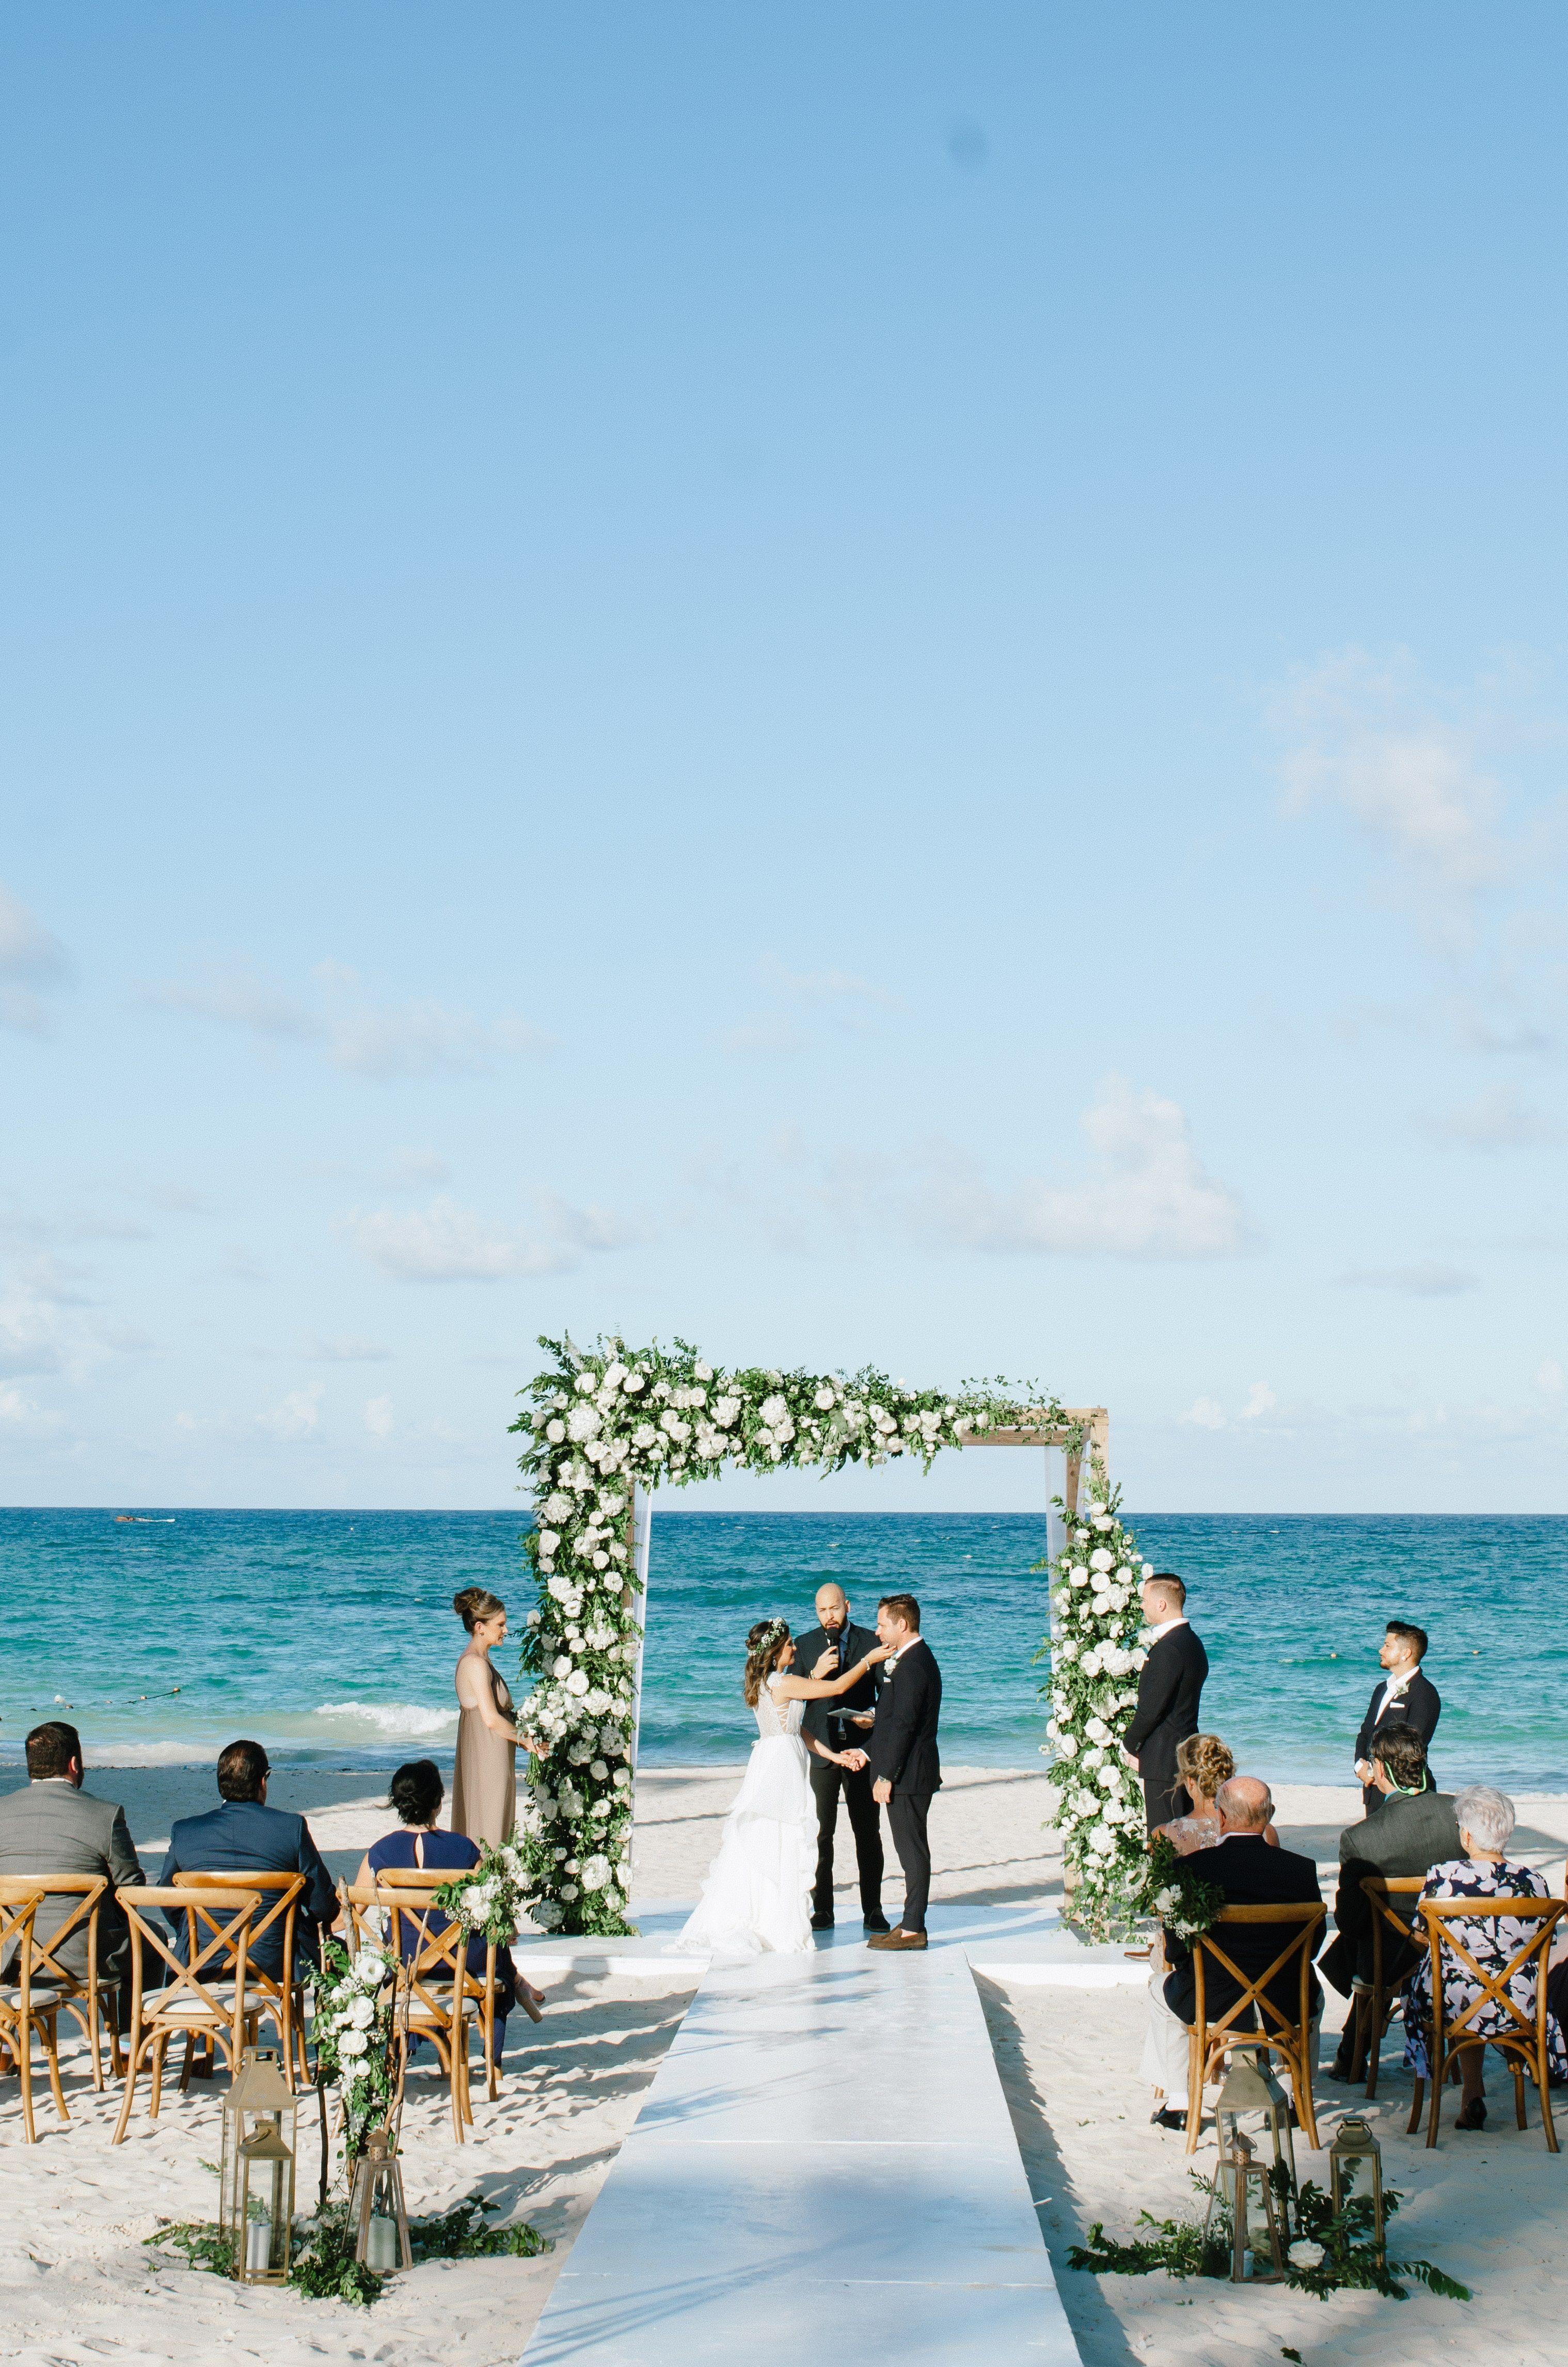 Romantic Beach Wedding Ceremony With Fabulous Wedding Arch Alter